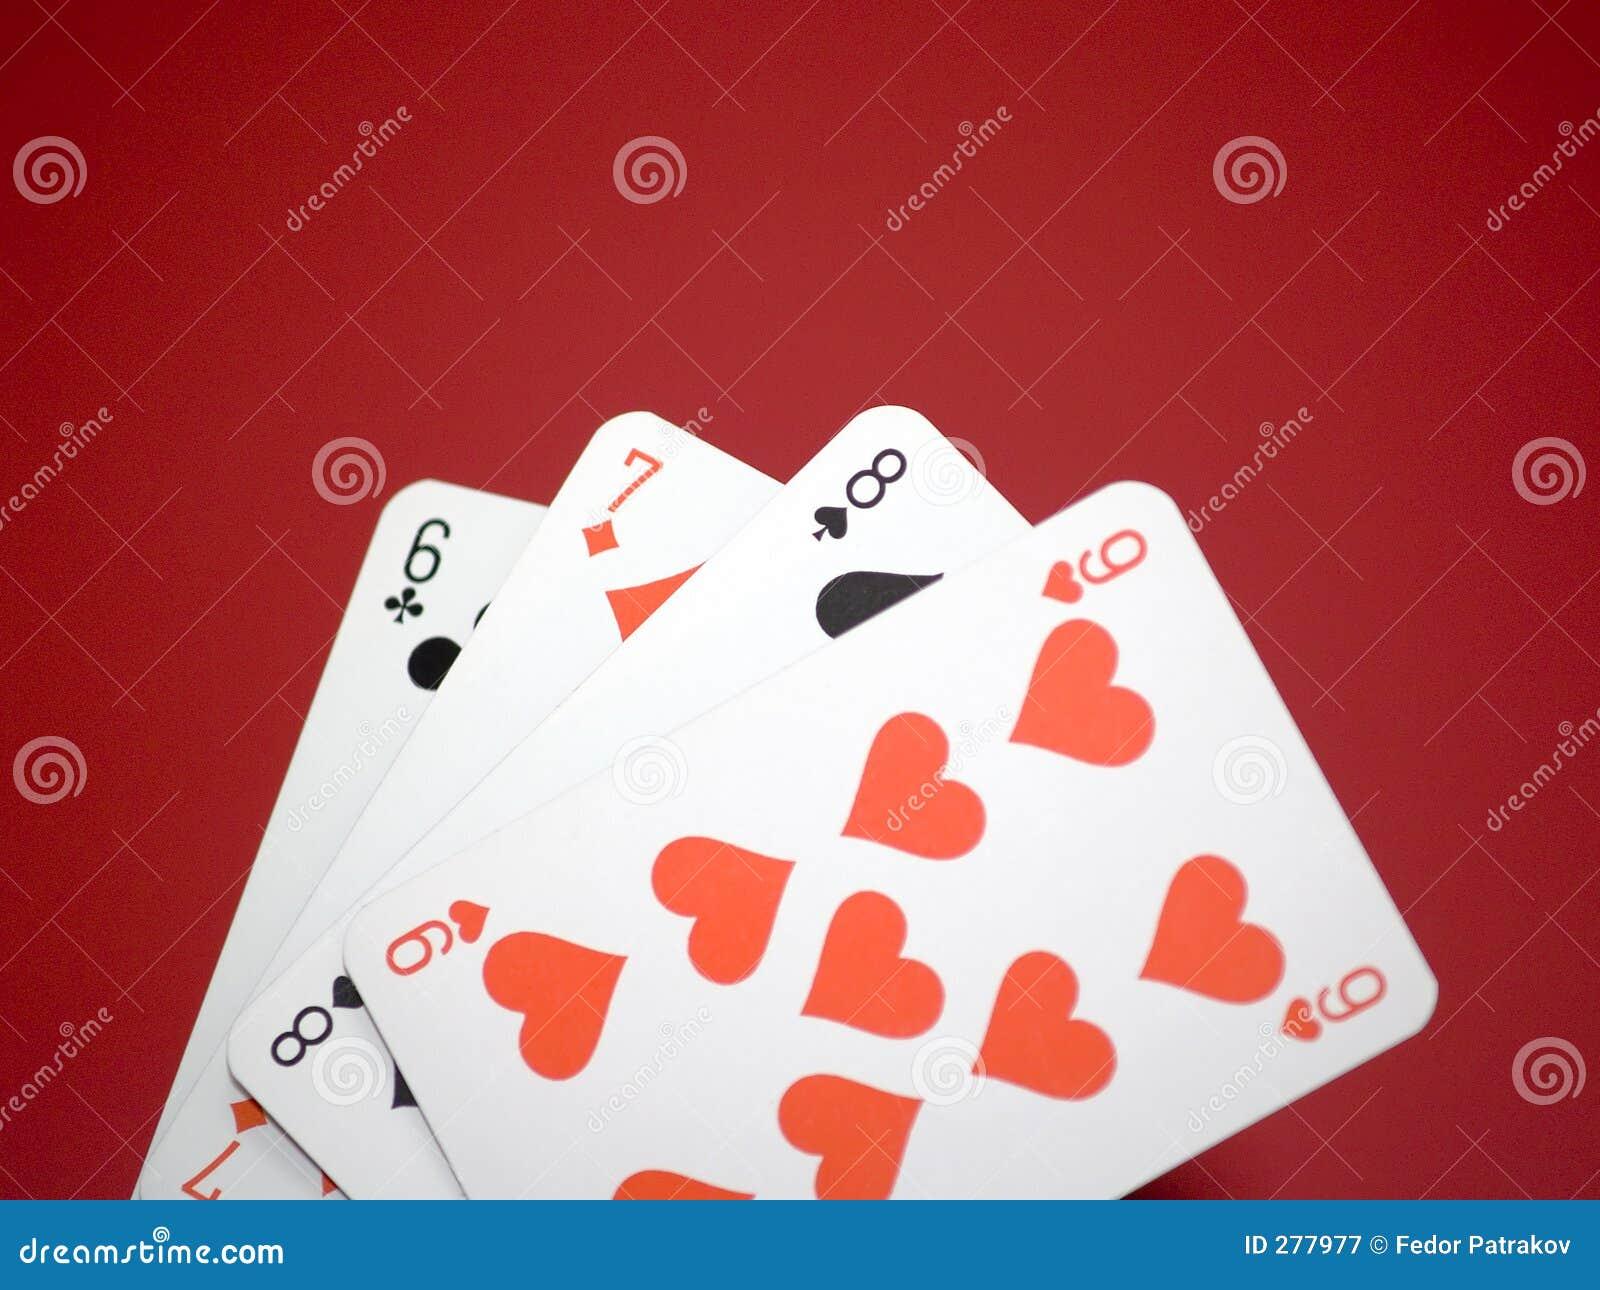 6 kort